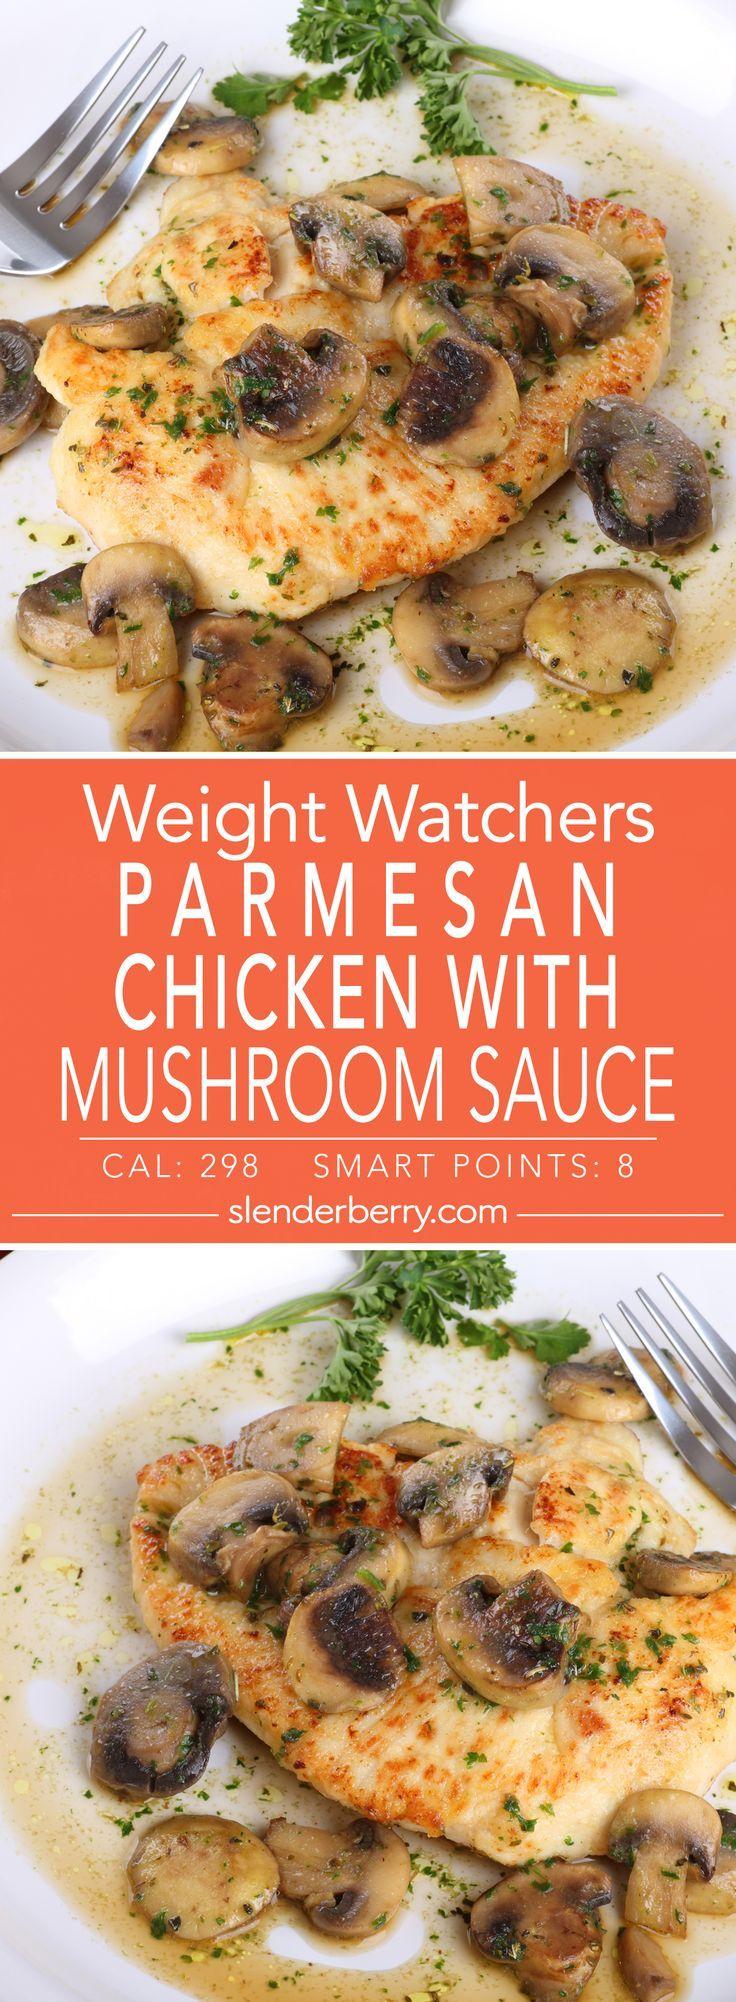 Parmesan Chicken with Mushroom Sauce